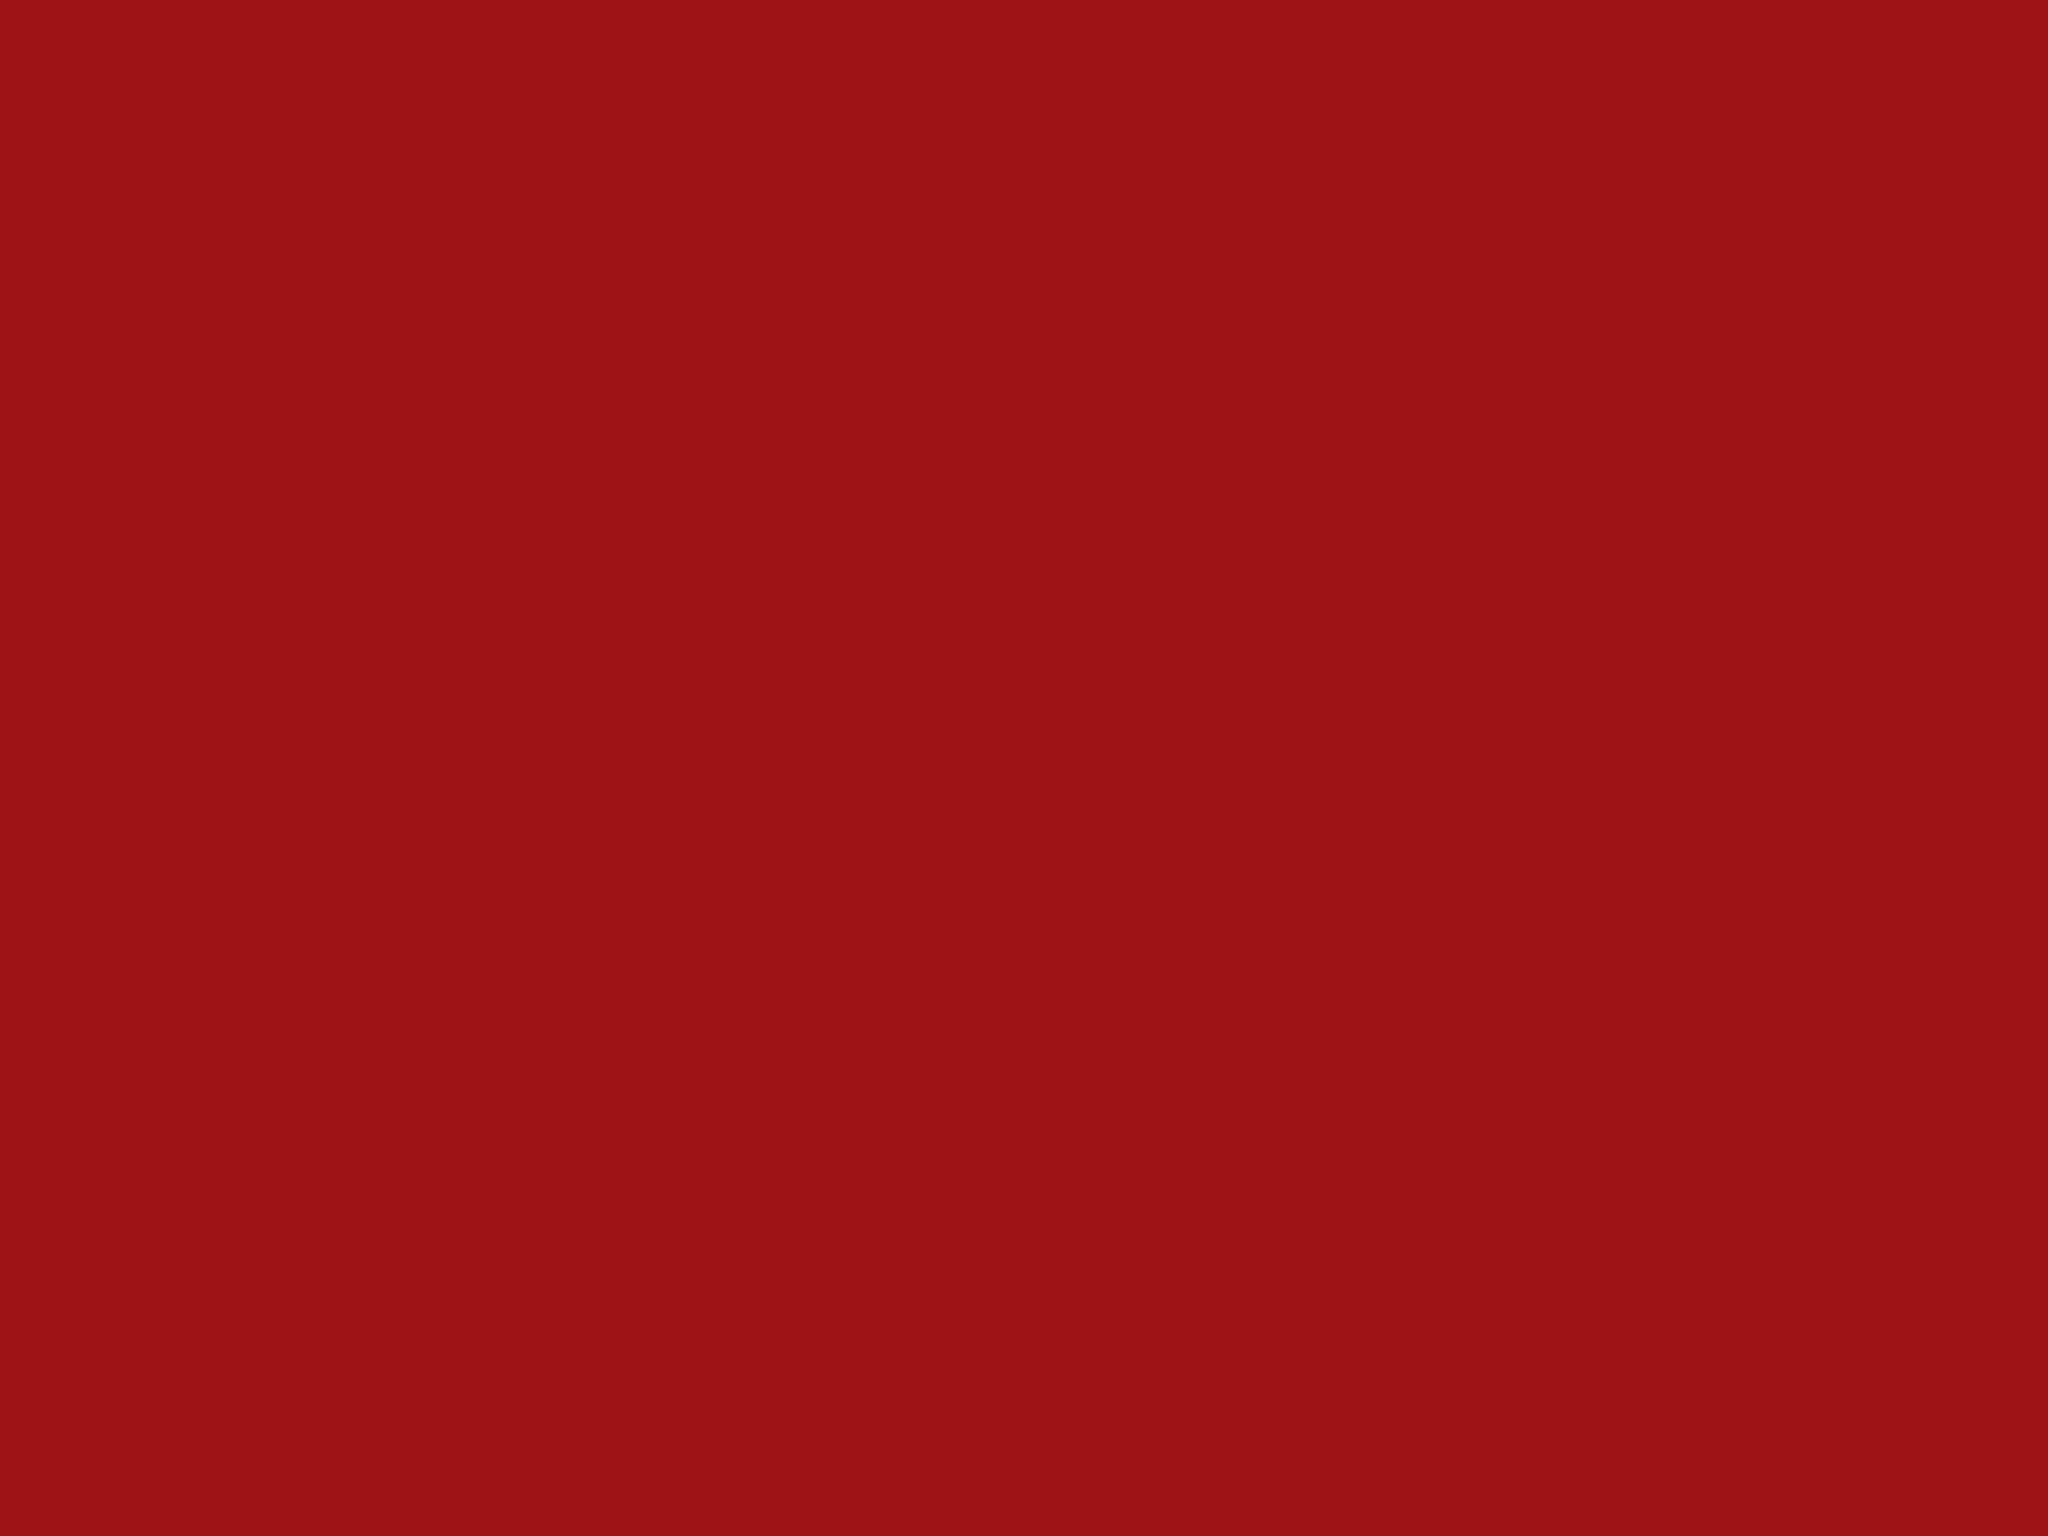 2048x1536 Spartan Crimson Solid Color Background